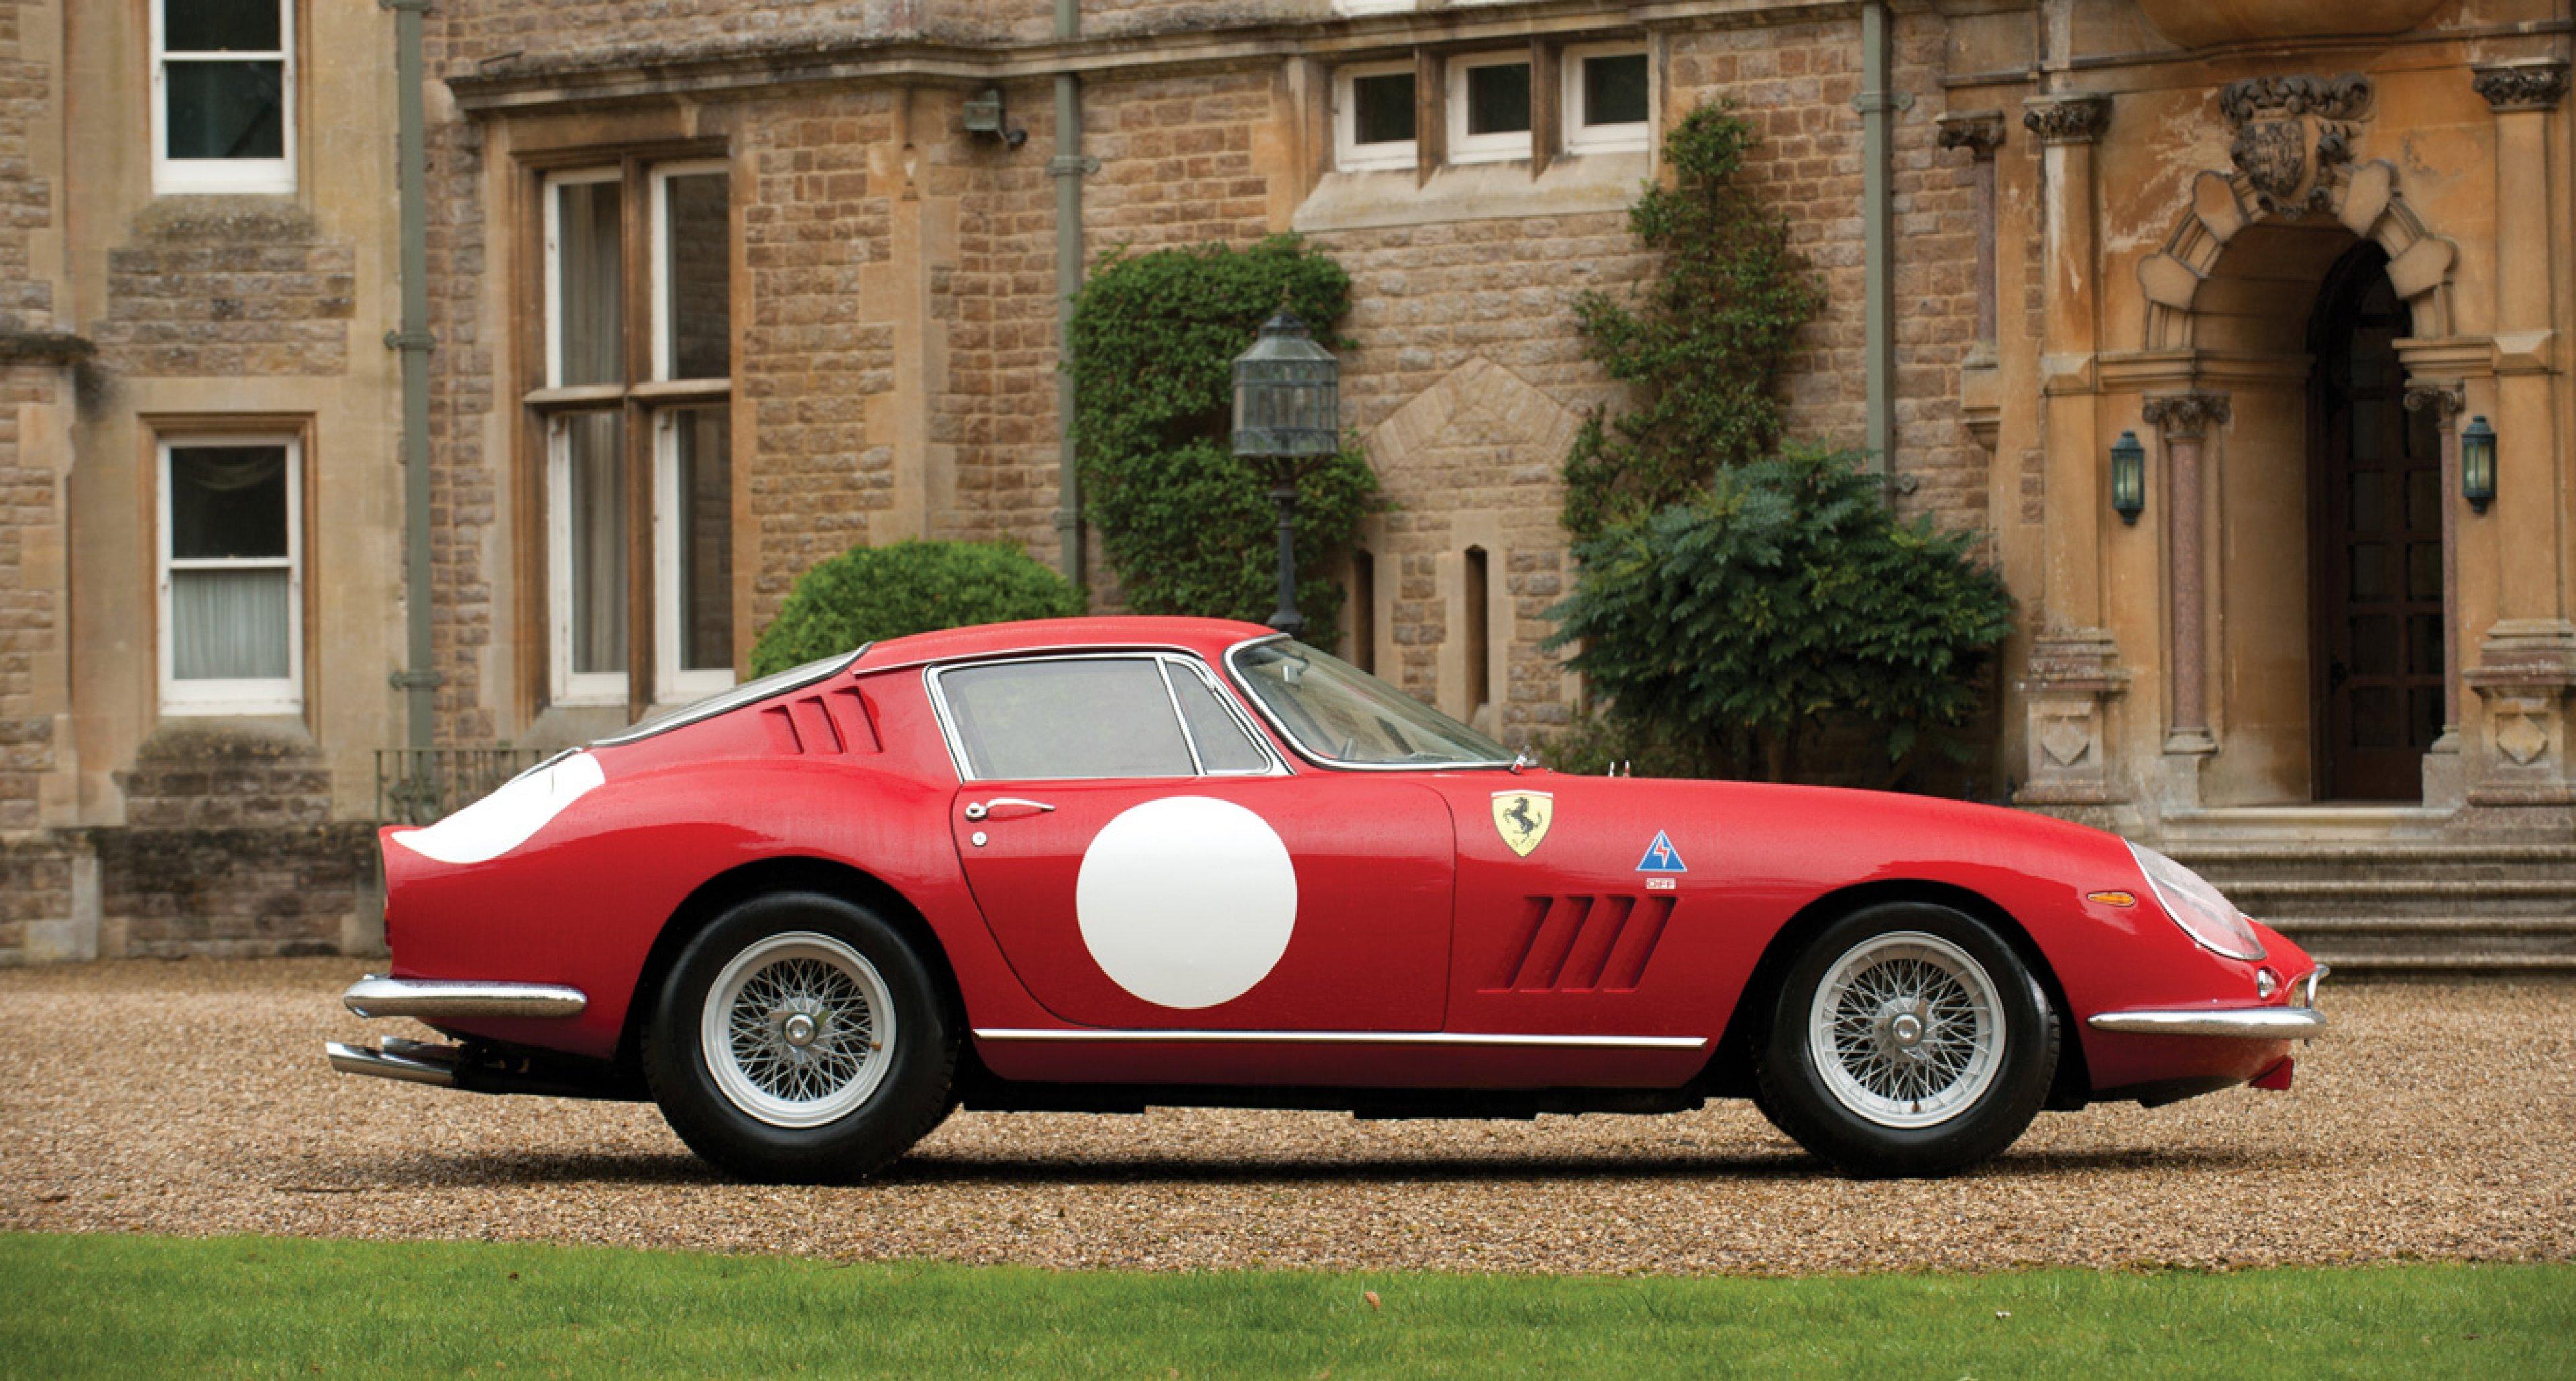 Lot 169 / 1966 Ferrari 275 GTB/C / € 5,712,000